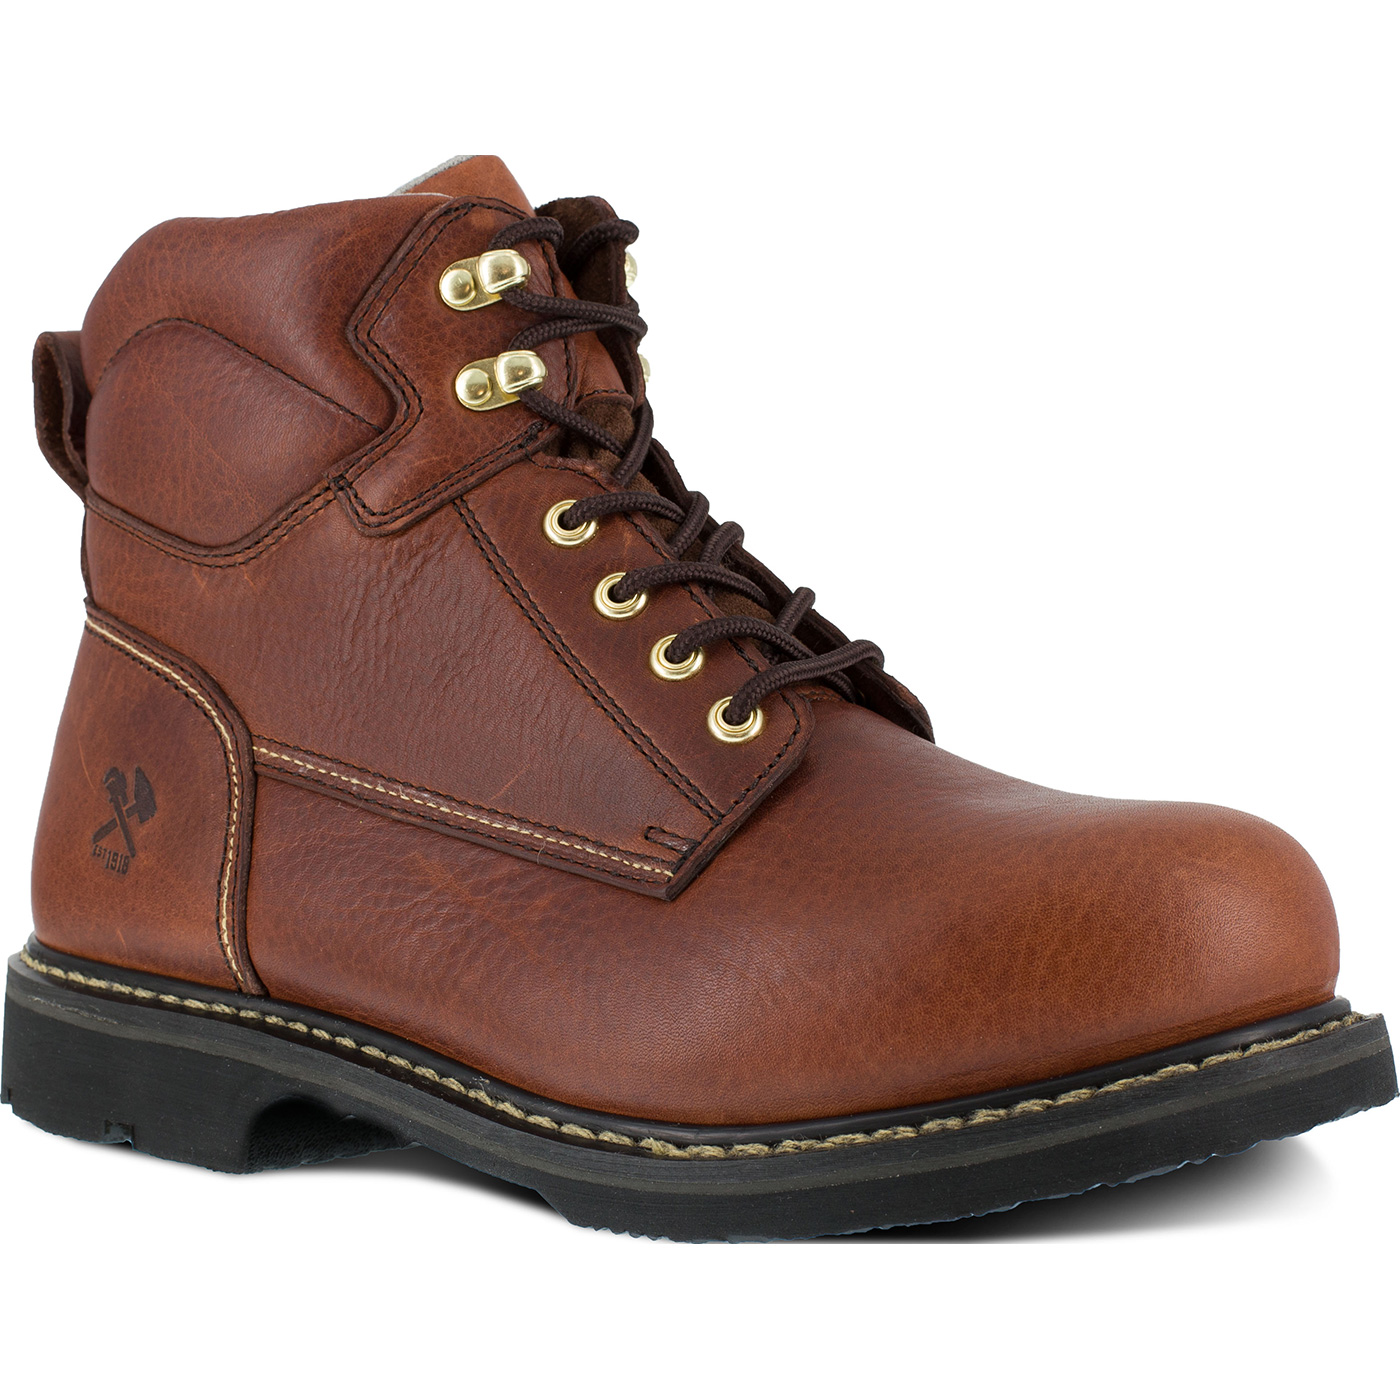 de1bba7a871 Iron Age Groundbreaker Men's 6 inch Steel Toe Electrical Hazard  Puncture-Resistant Work Boot